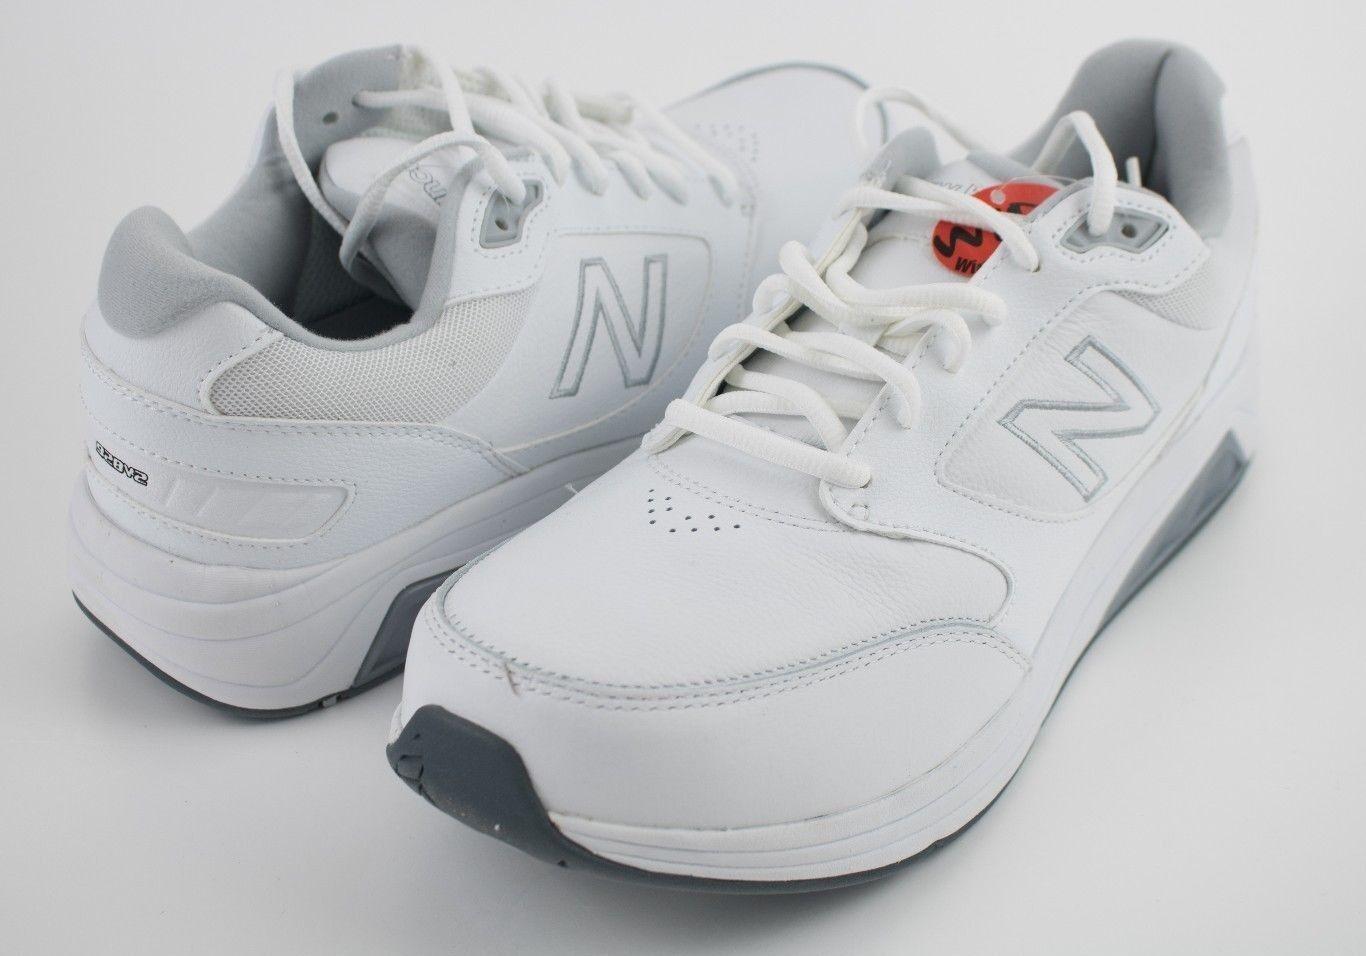 NEW BALANCE Uomo MW928WT2 MW928WT2 MW928WT2 WALKING scarpe da ginnastica 3d1f1c